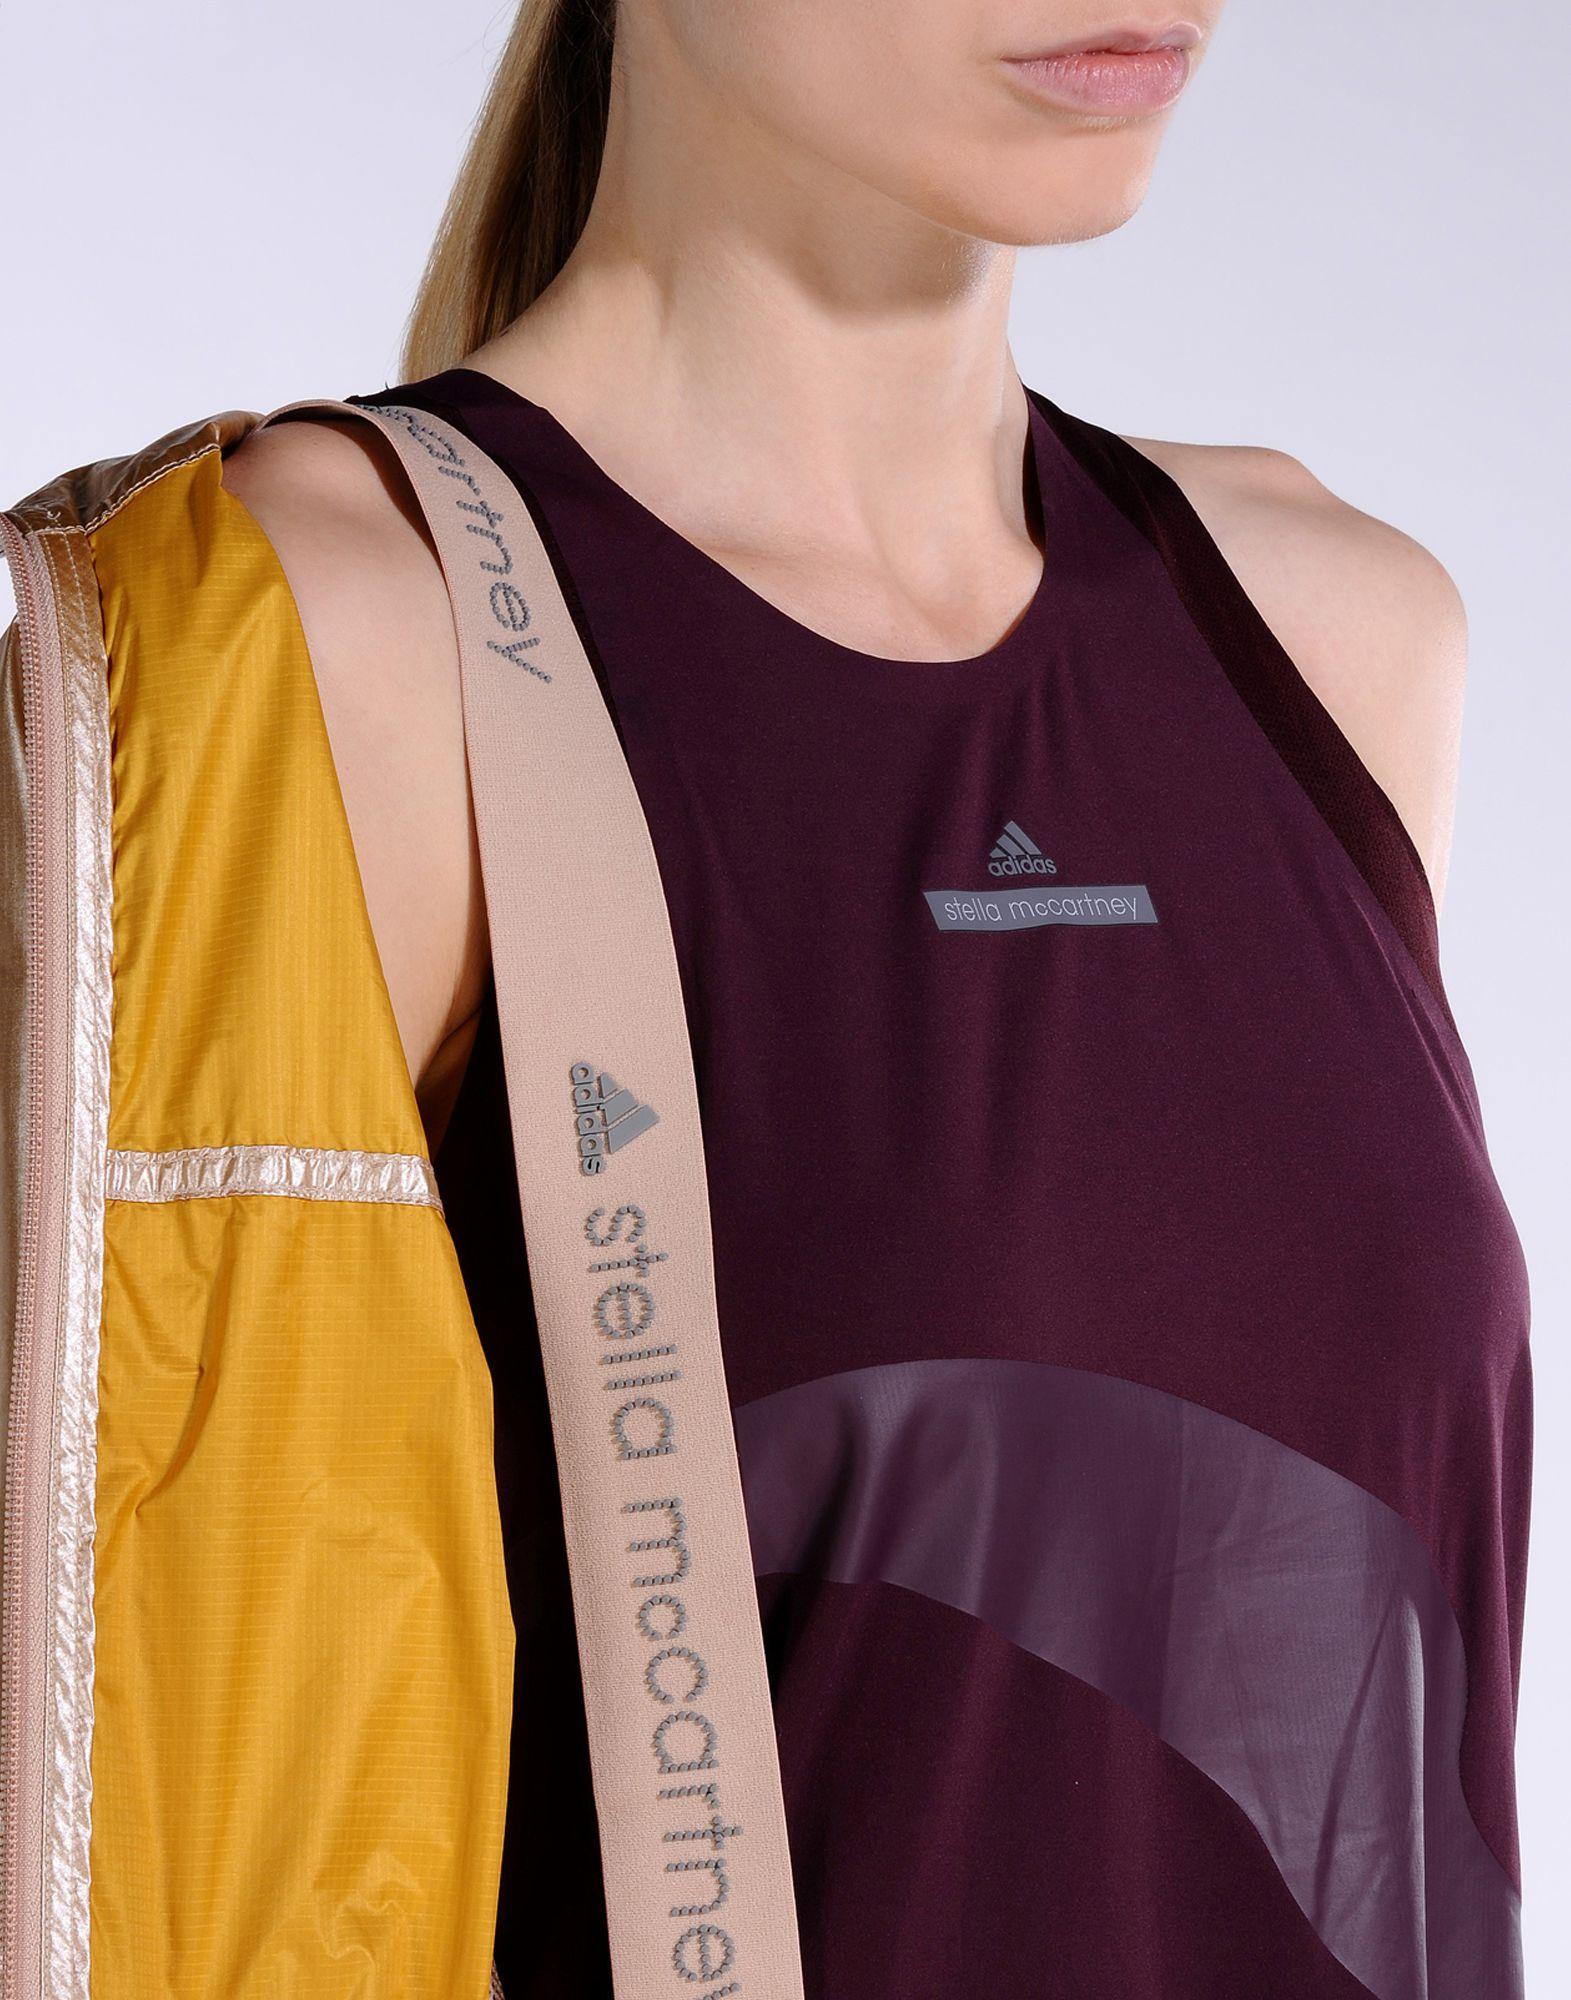 Adidas by stella mccartney run metal jacket 5